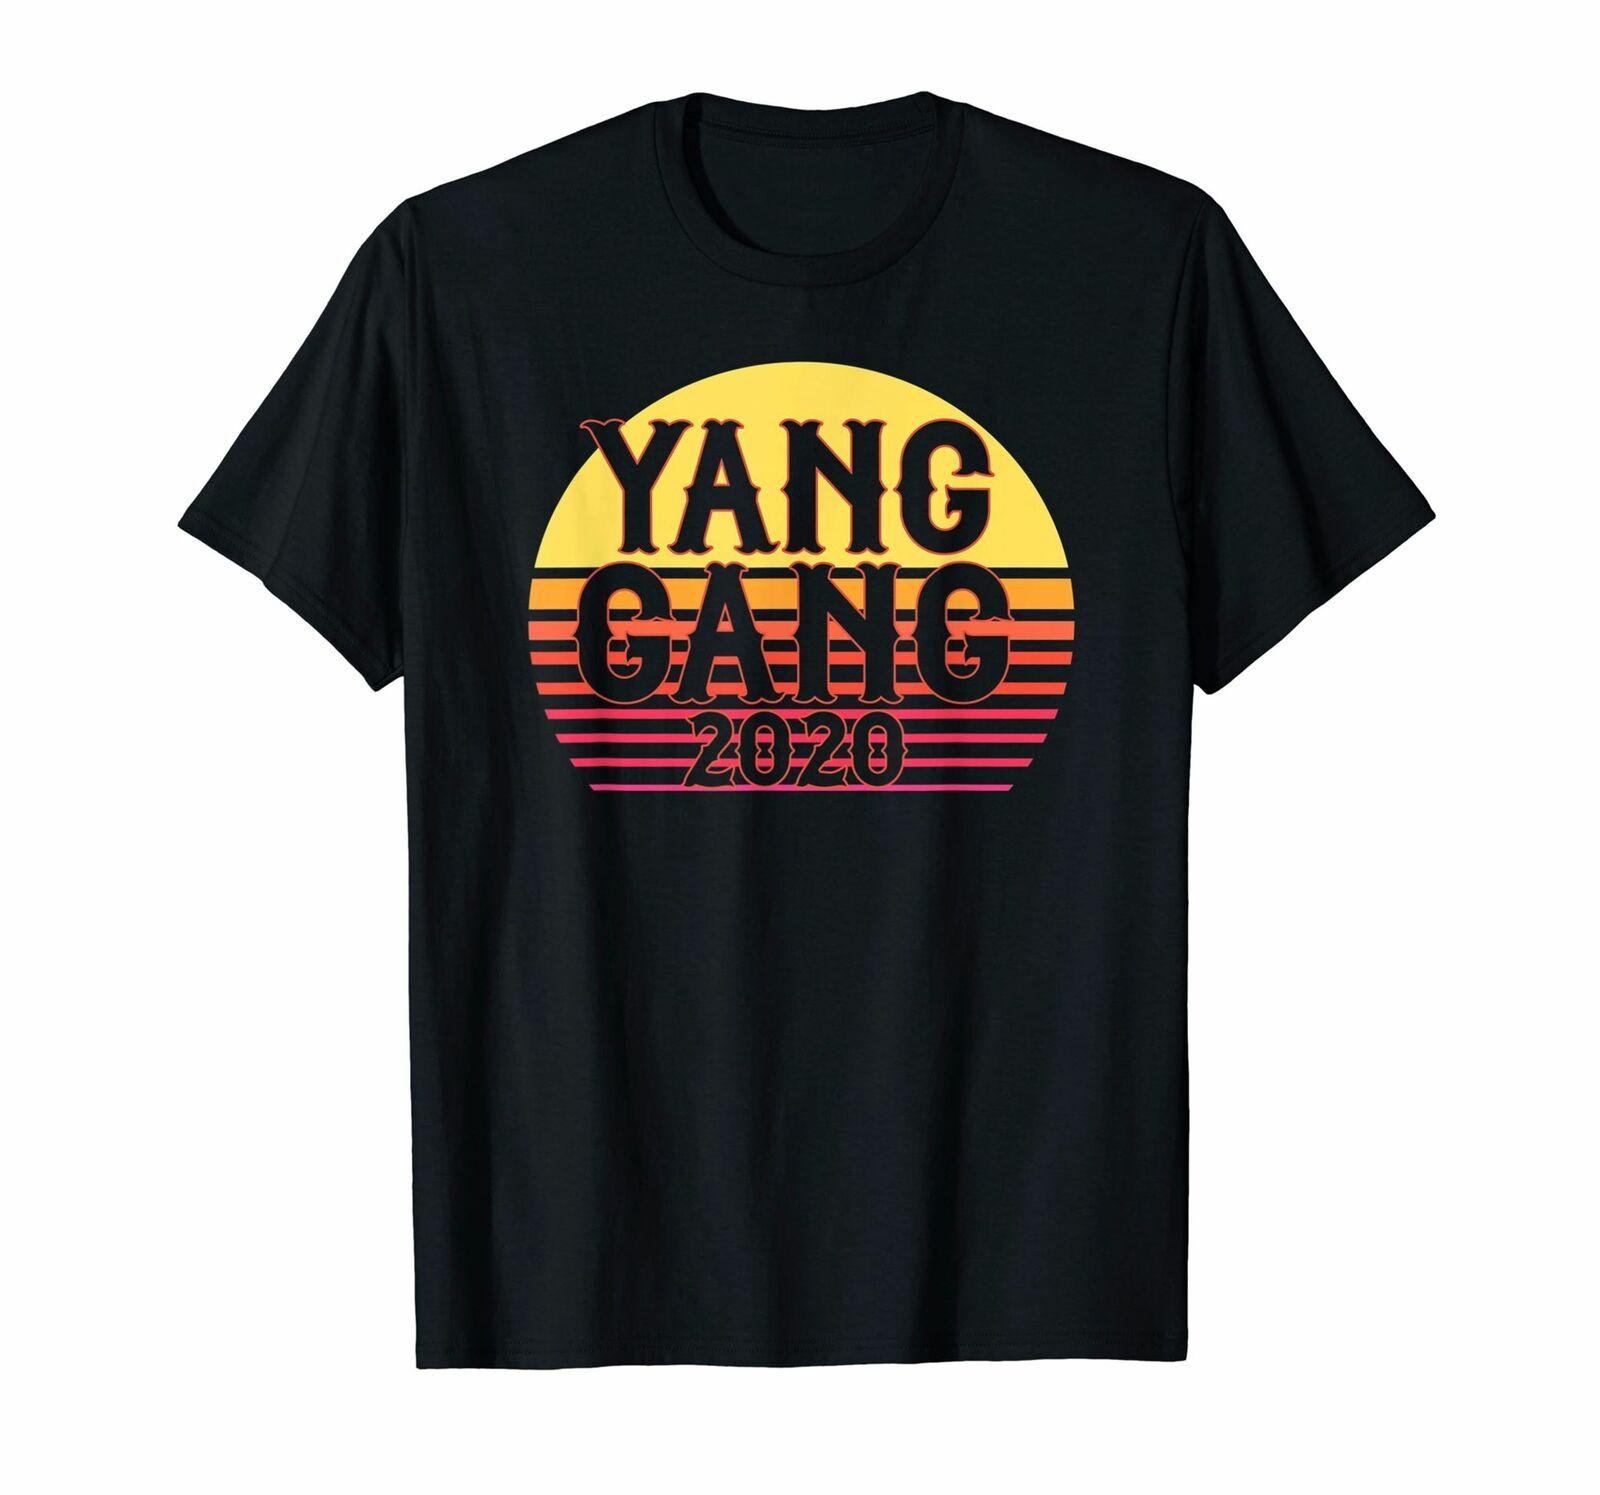 Camiseta de Yang Gang 2020, camisetas gráficas UBI para hombres, para presidente de EE. UU.